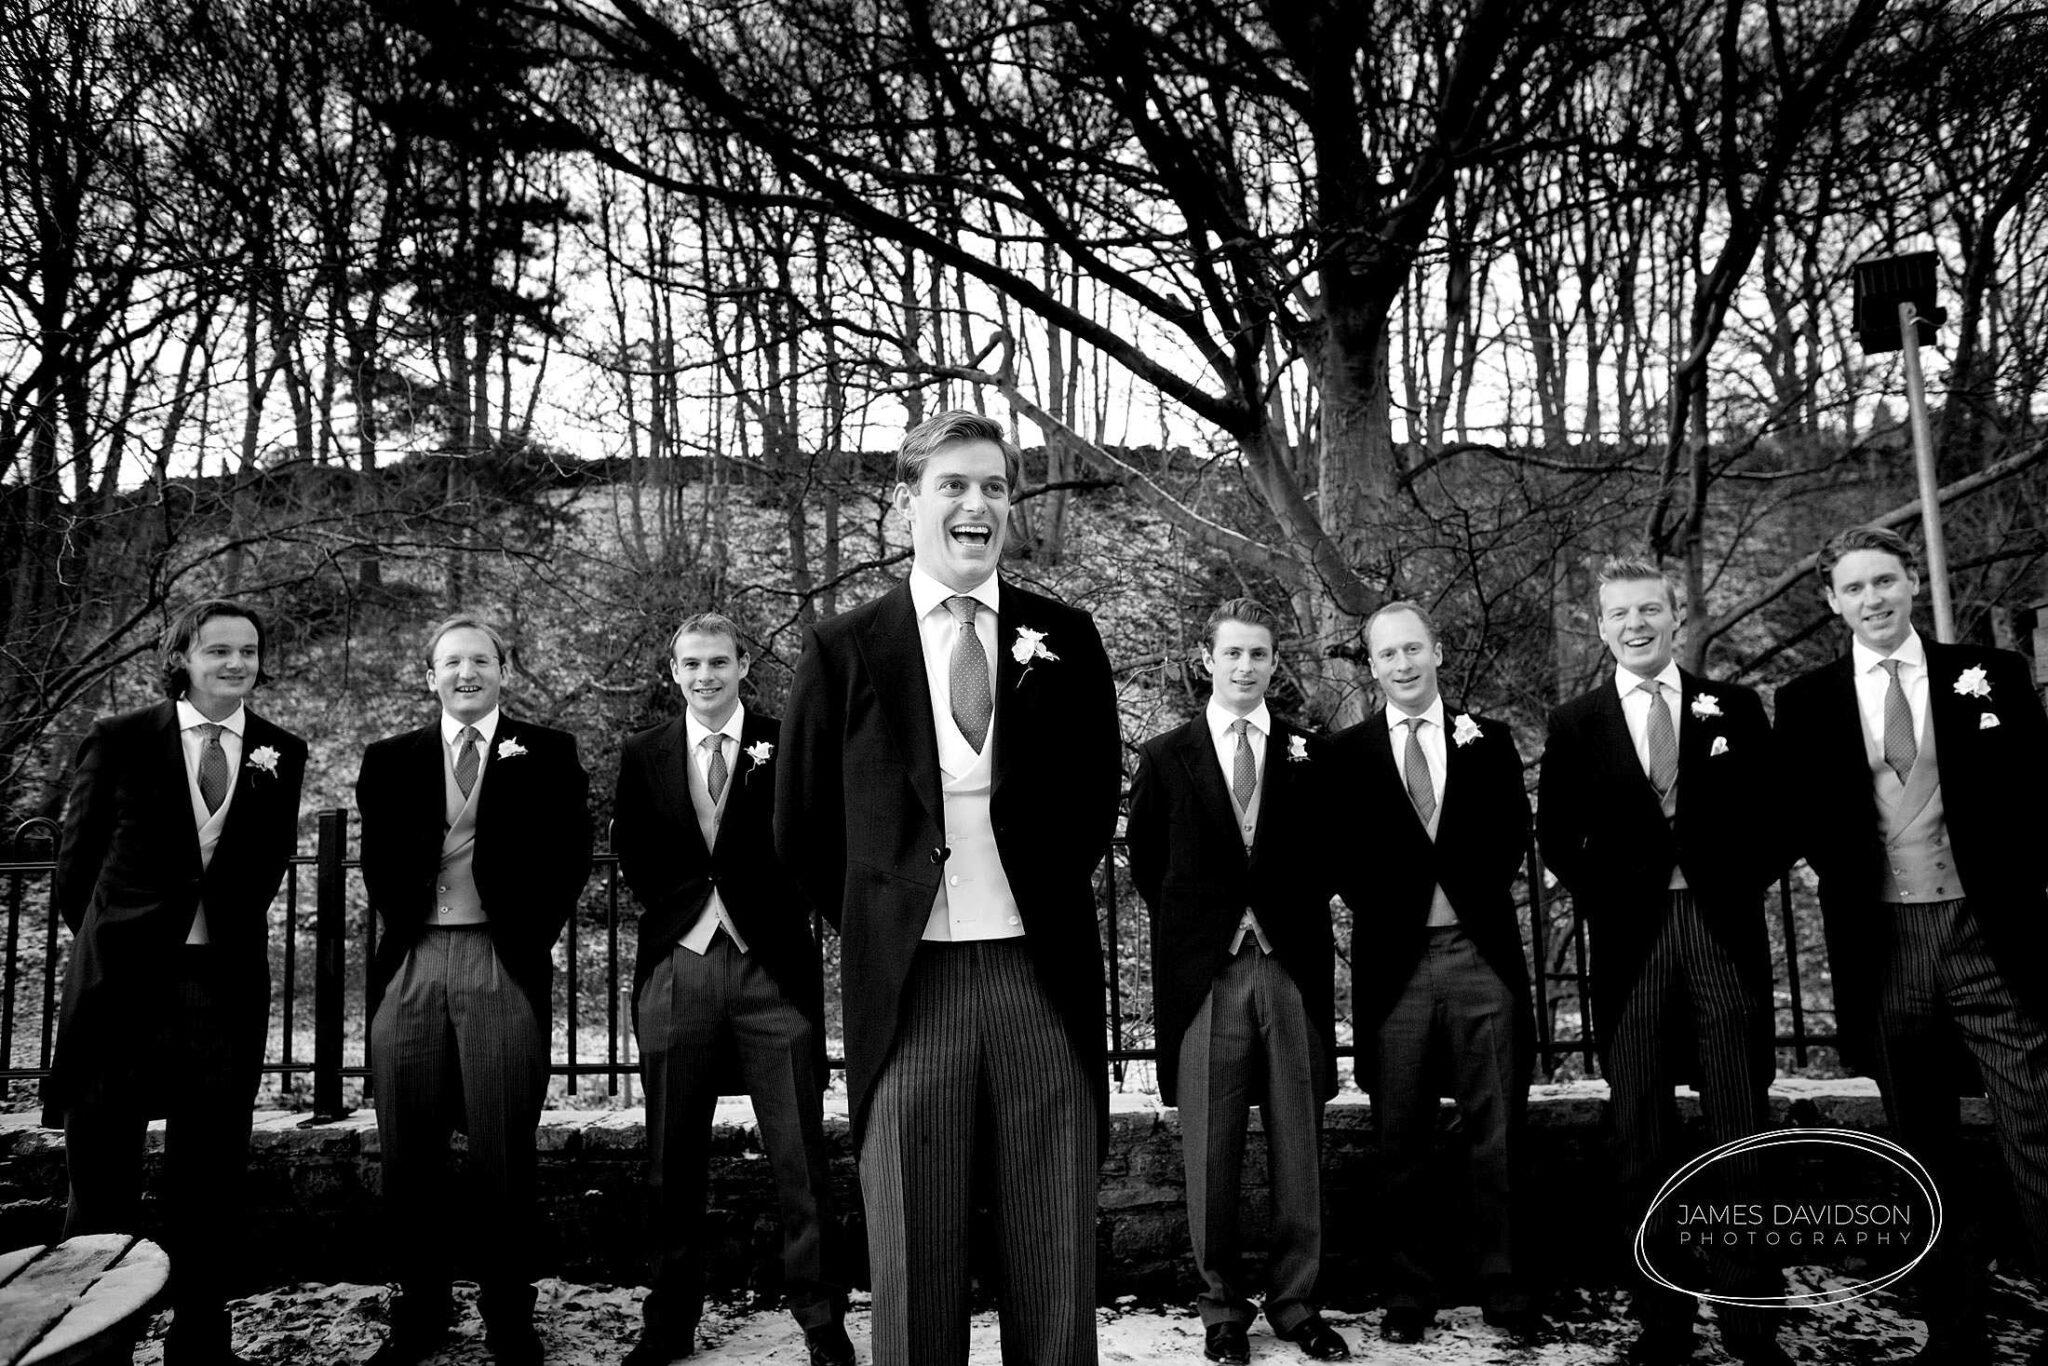 huddersfield-wedding-photography-009